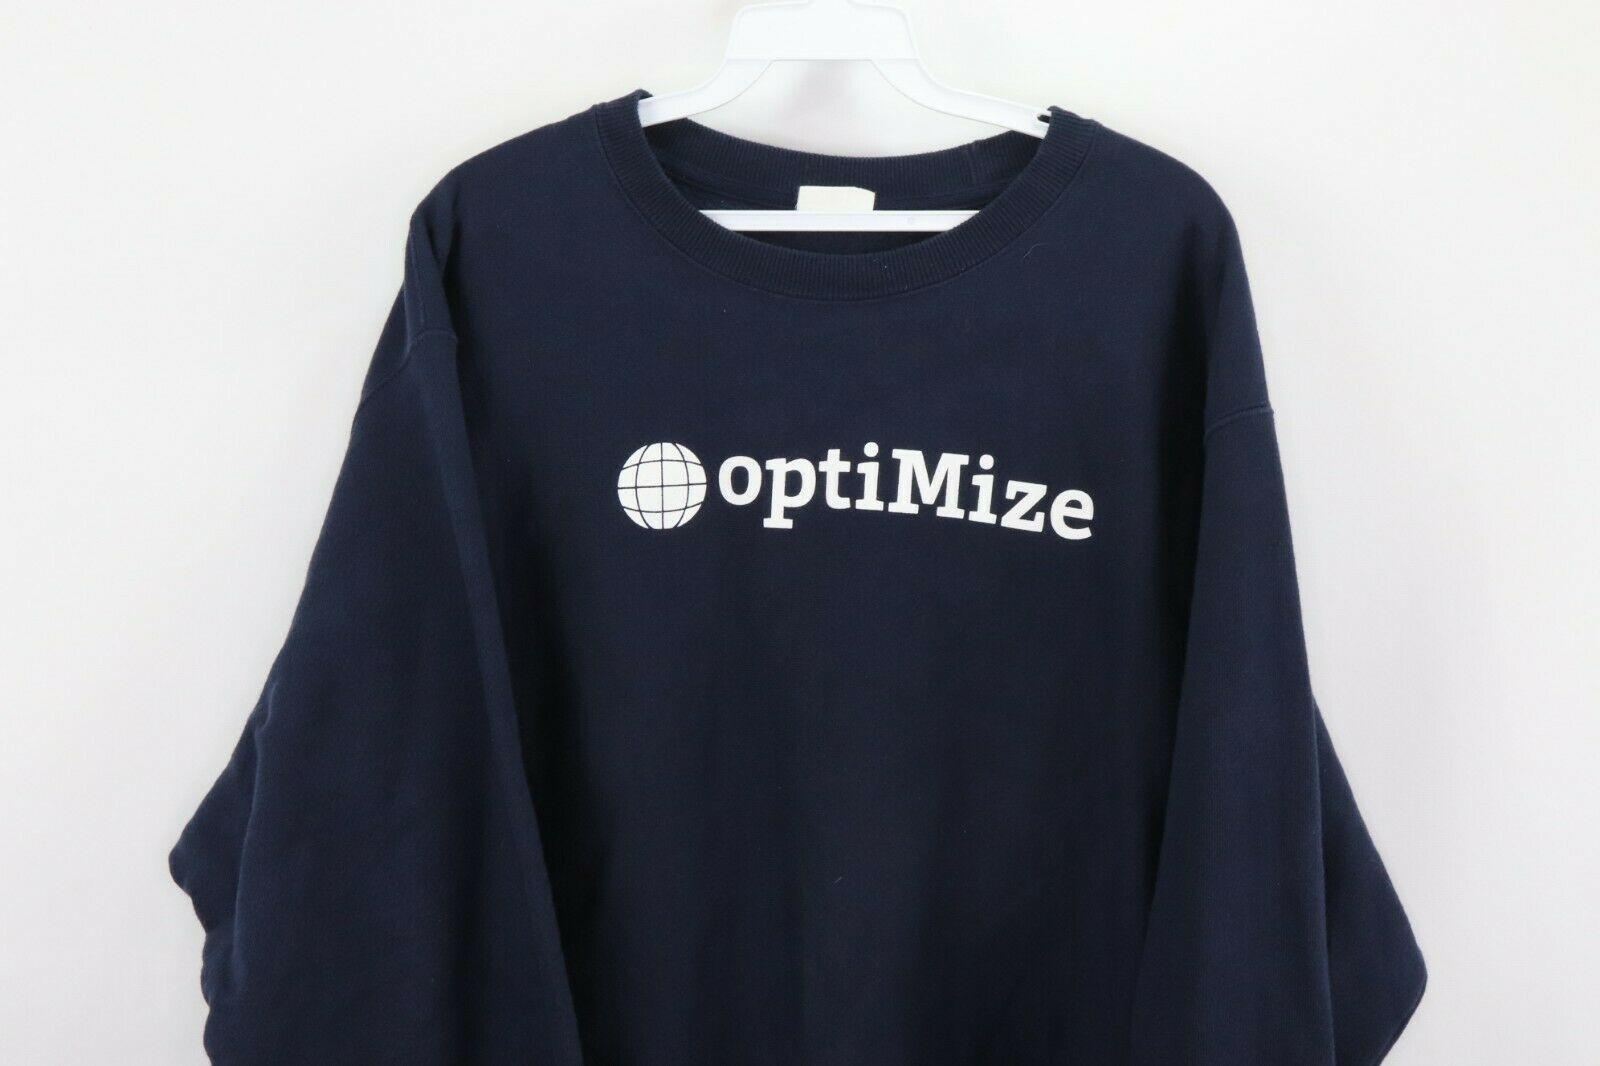 Champion Reverse Weave Mens Large Optimize Spell Out Crewneck Sweatshirt Blue image 2